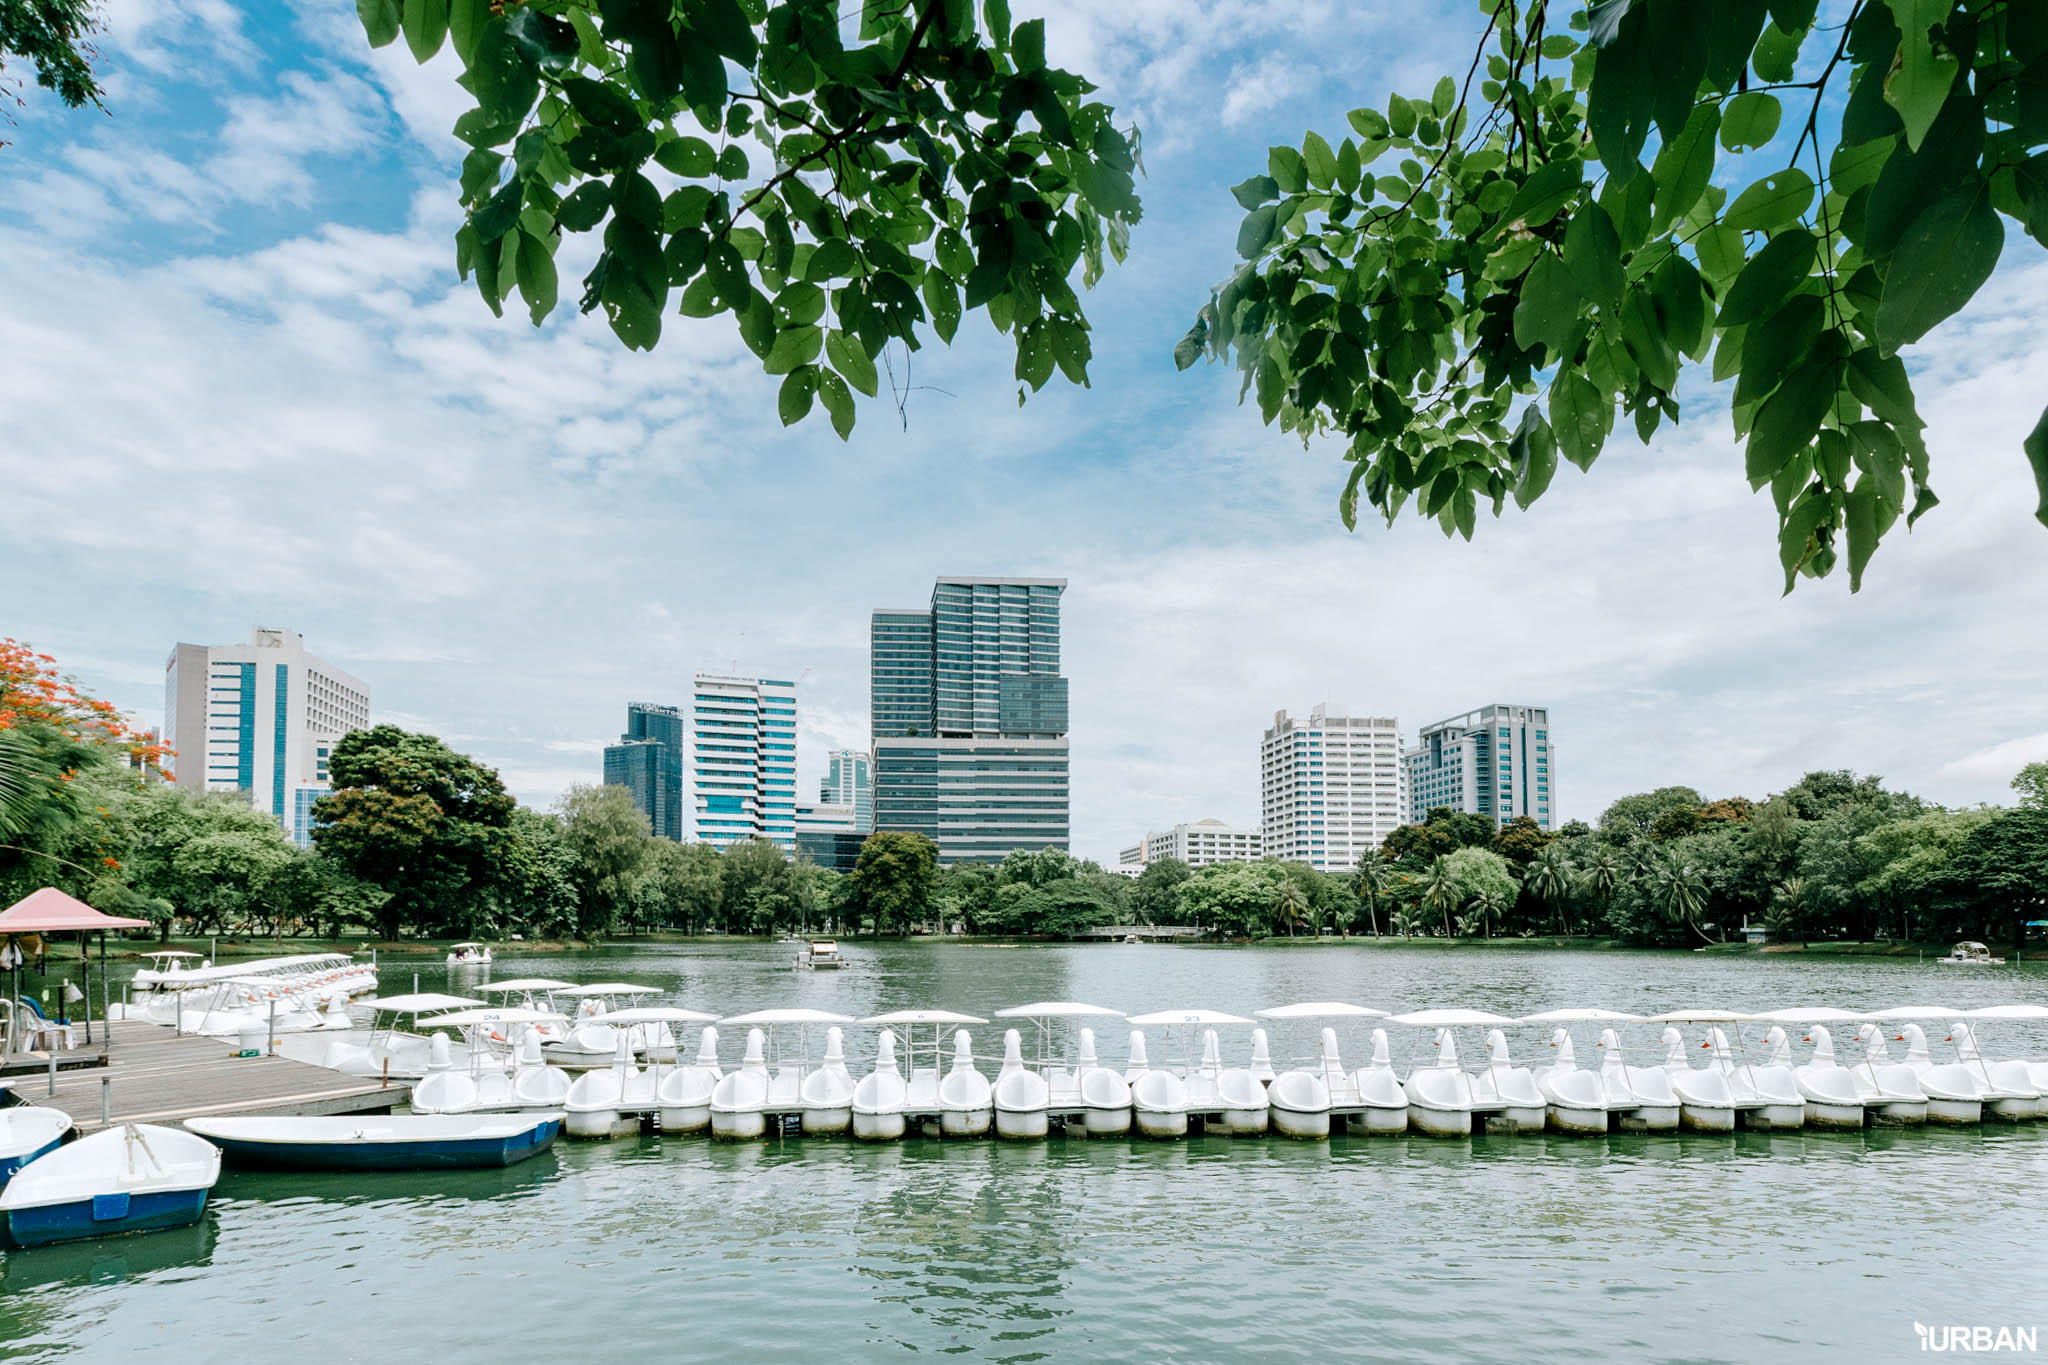 "12 Guide invite Farang เที่ยวราชประสงค์-ชิดลมจนต้องร้องว่า ""ไอเลิฟเมืองไทย ไอไลค์ชิดลม!"" 44 - Bangkok"